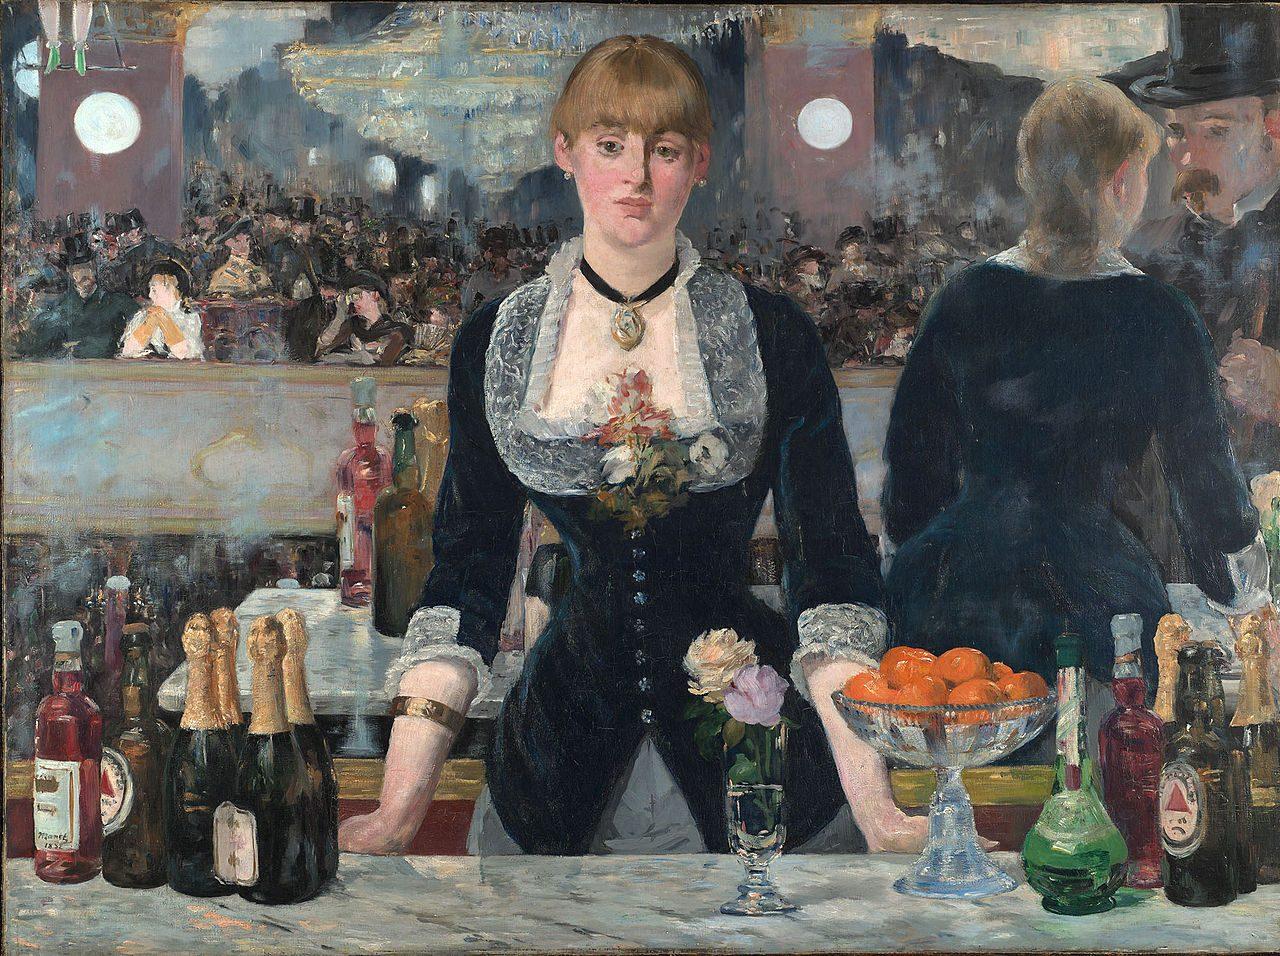 Opera di Édouard Manet nella Courtauld Gallery